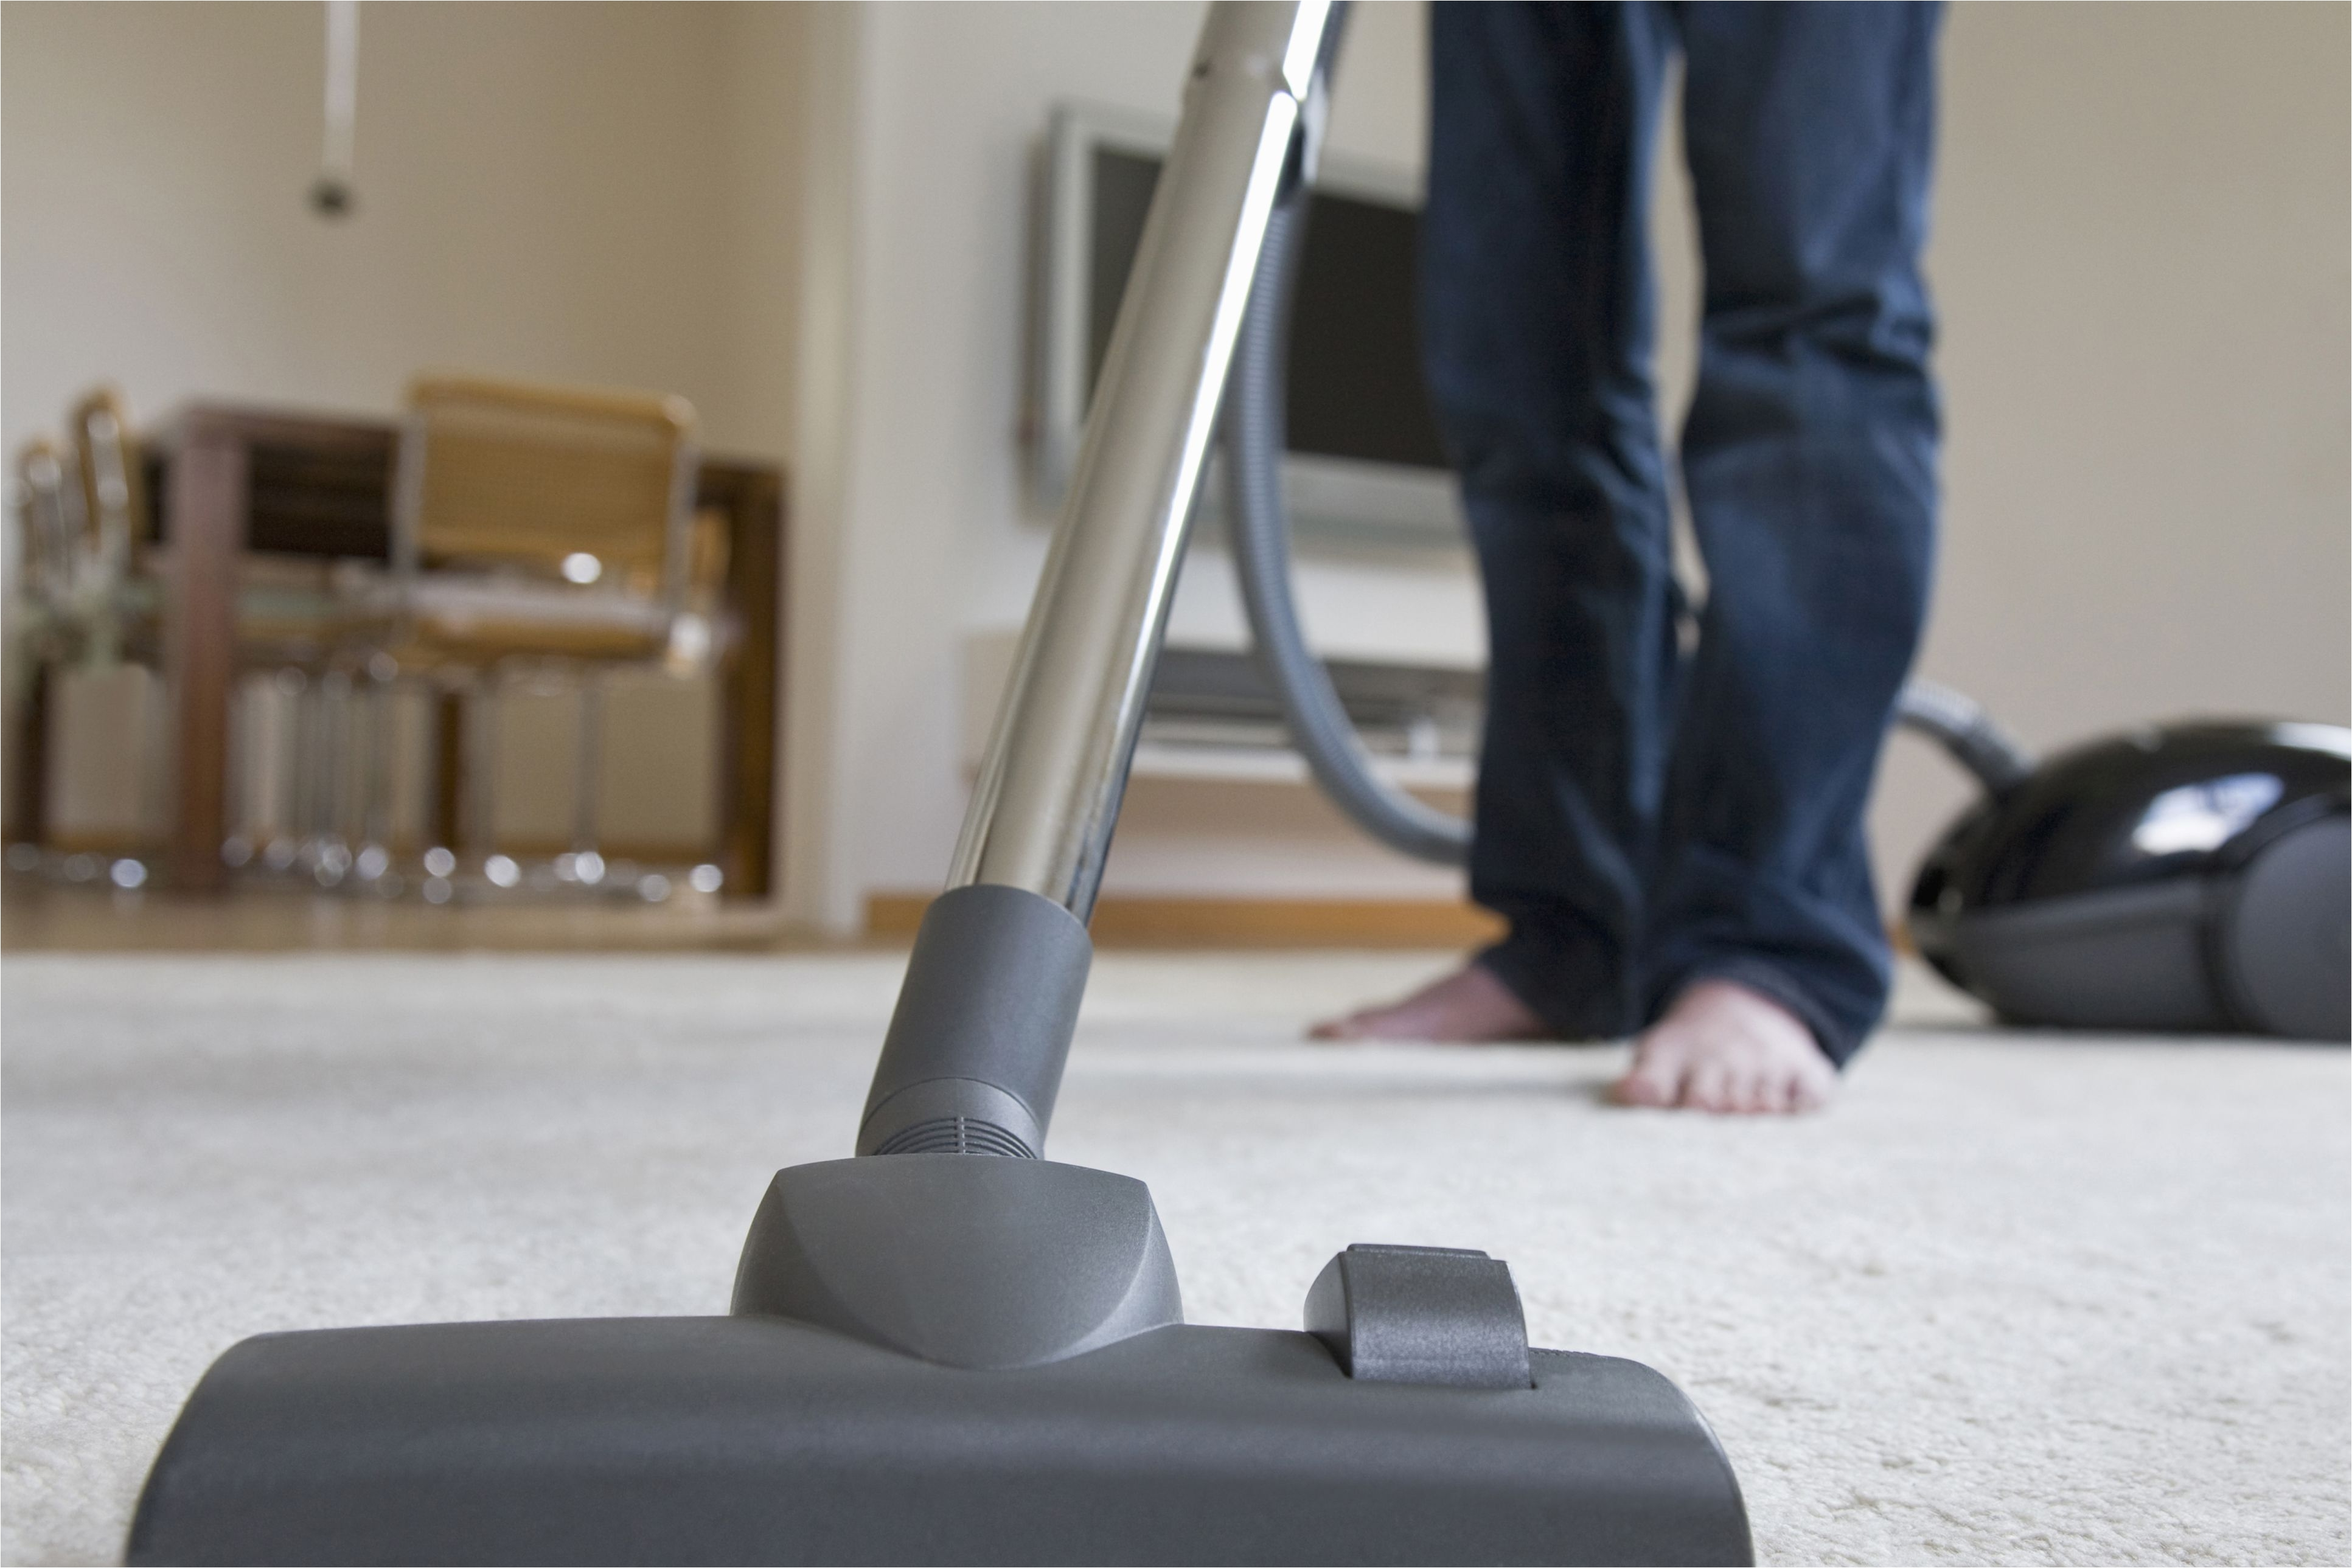 vacuuming carpet 56a812a93df78cf7729be1cb jpg